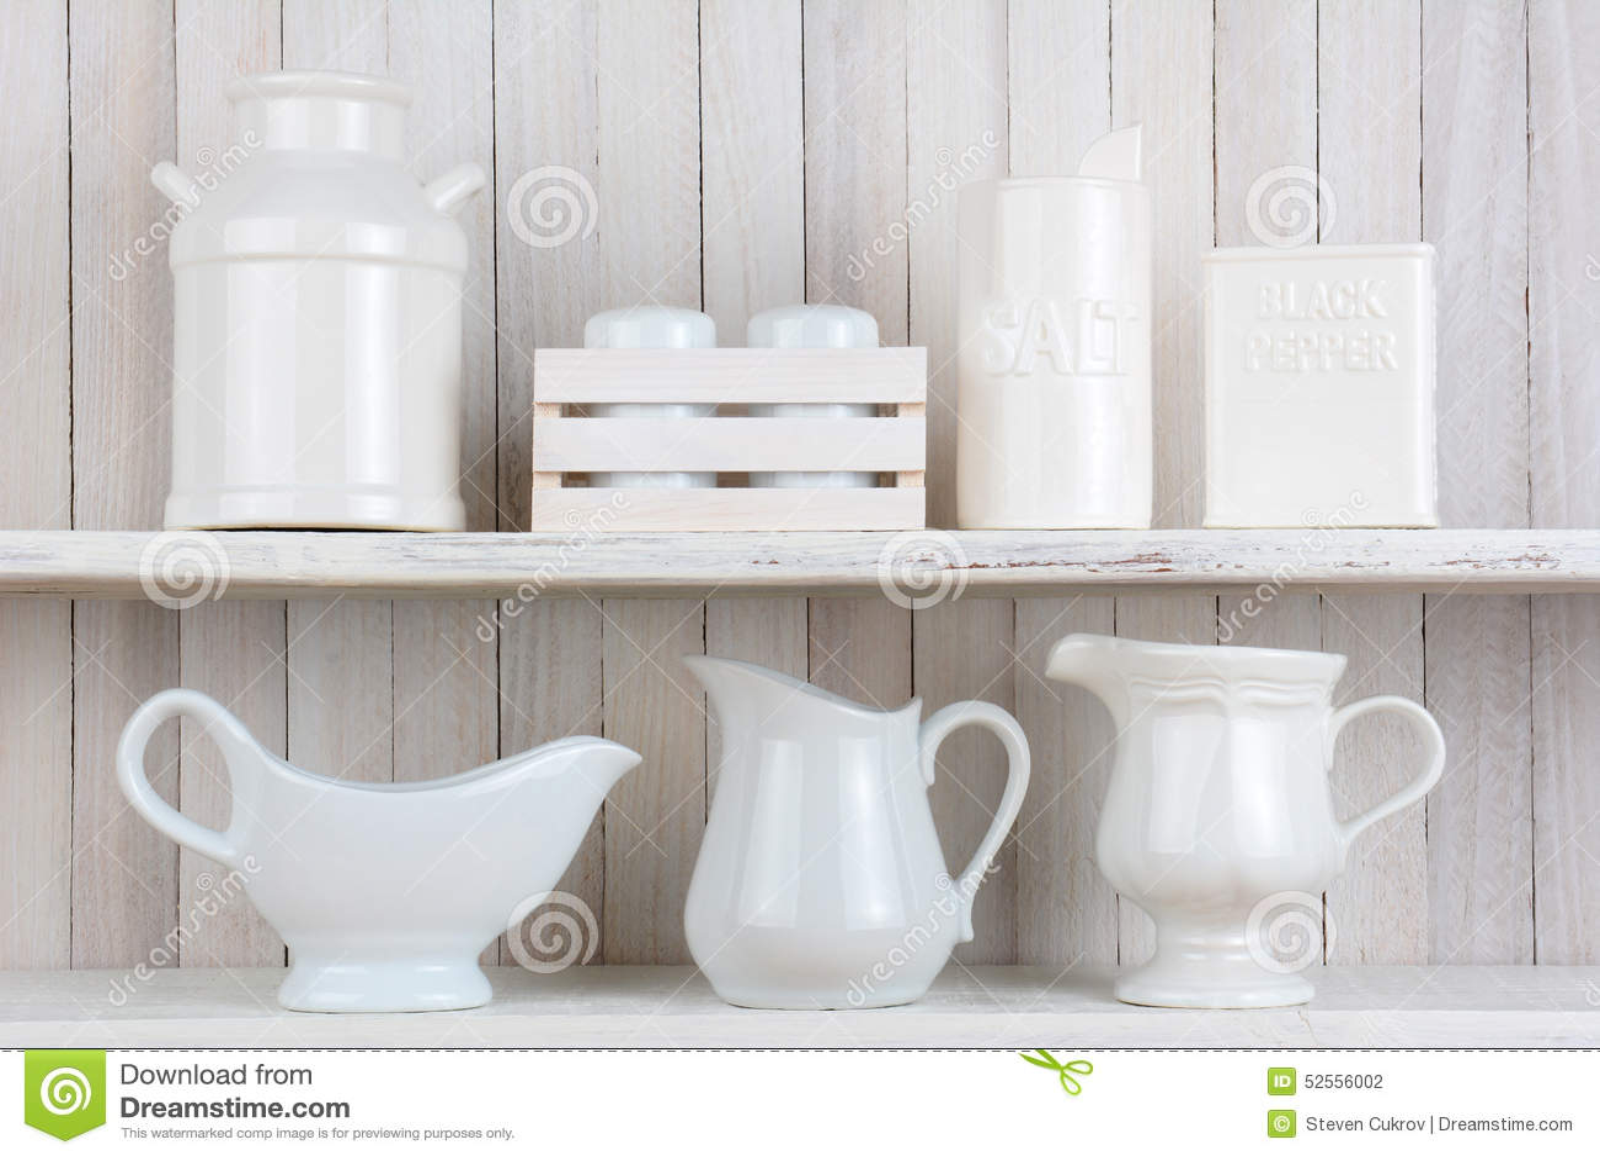 wei e rustikale k chen regale stockfoto bild 52556002. Black Bedroom Furniture Sets. Home Design Ideas